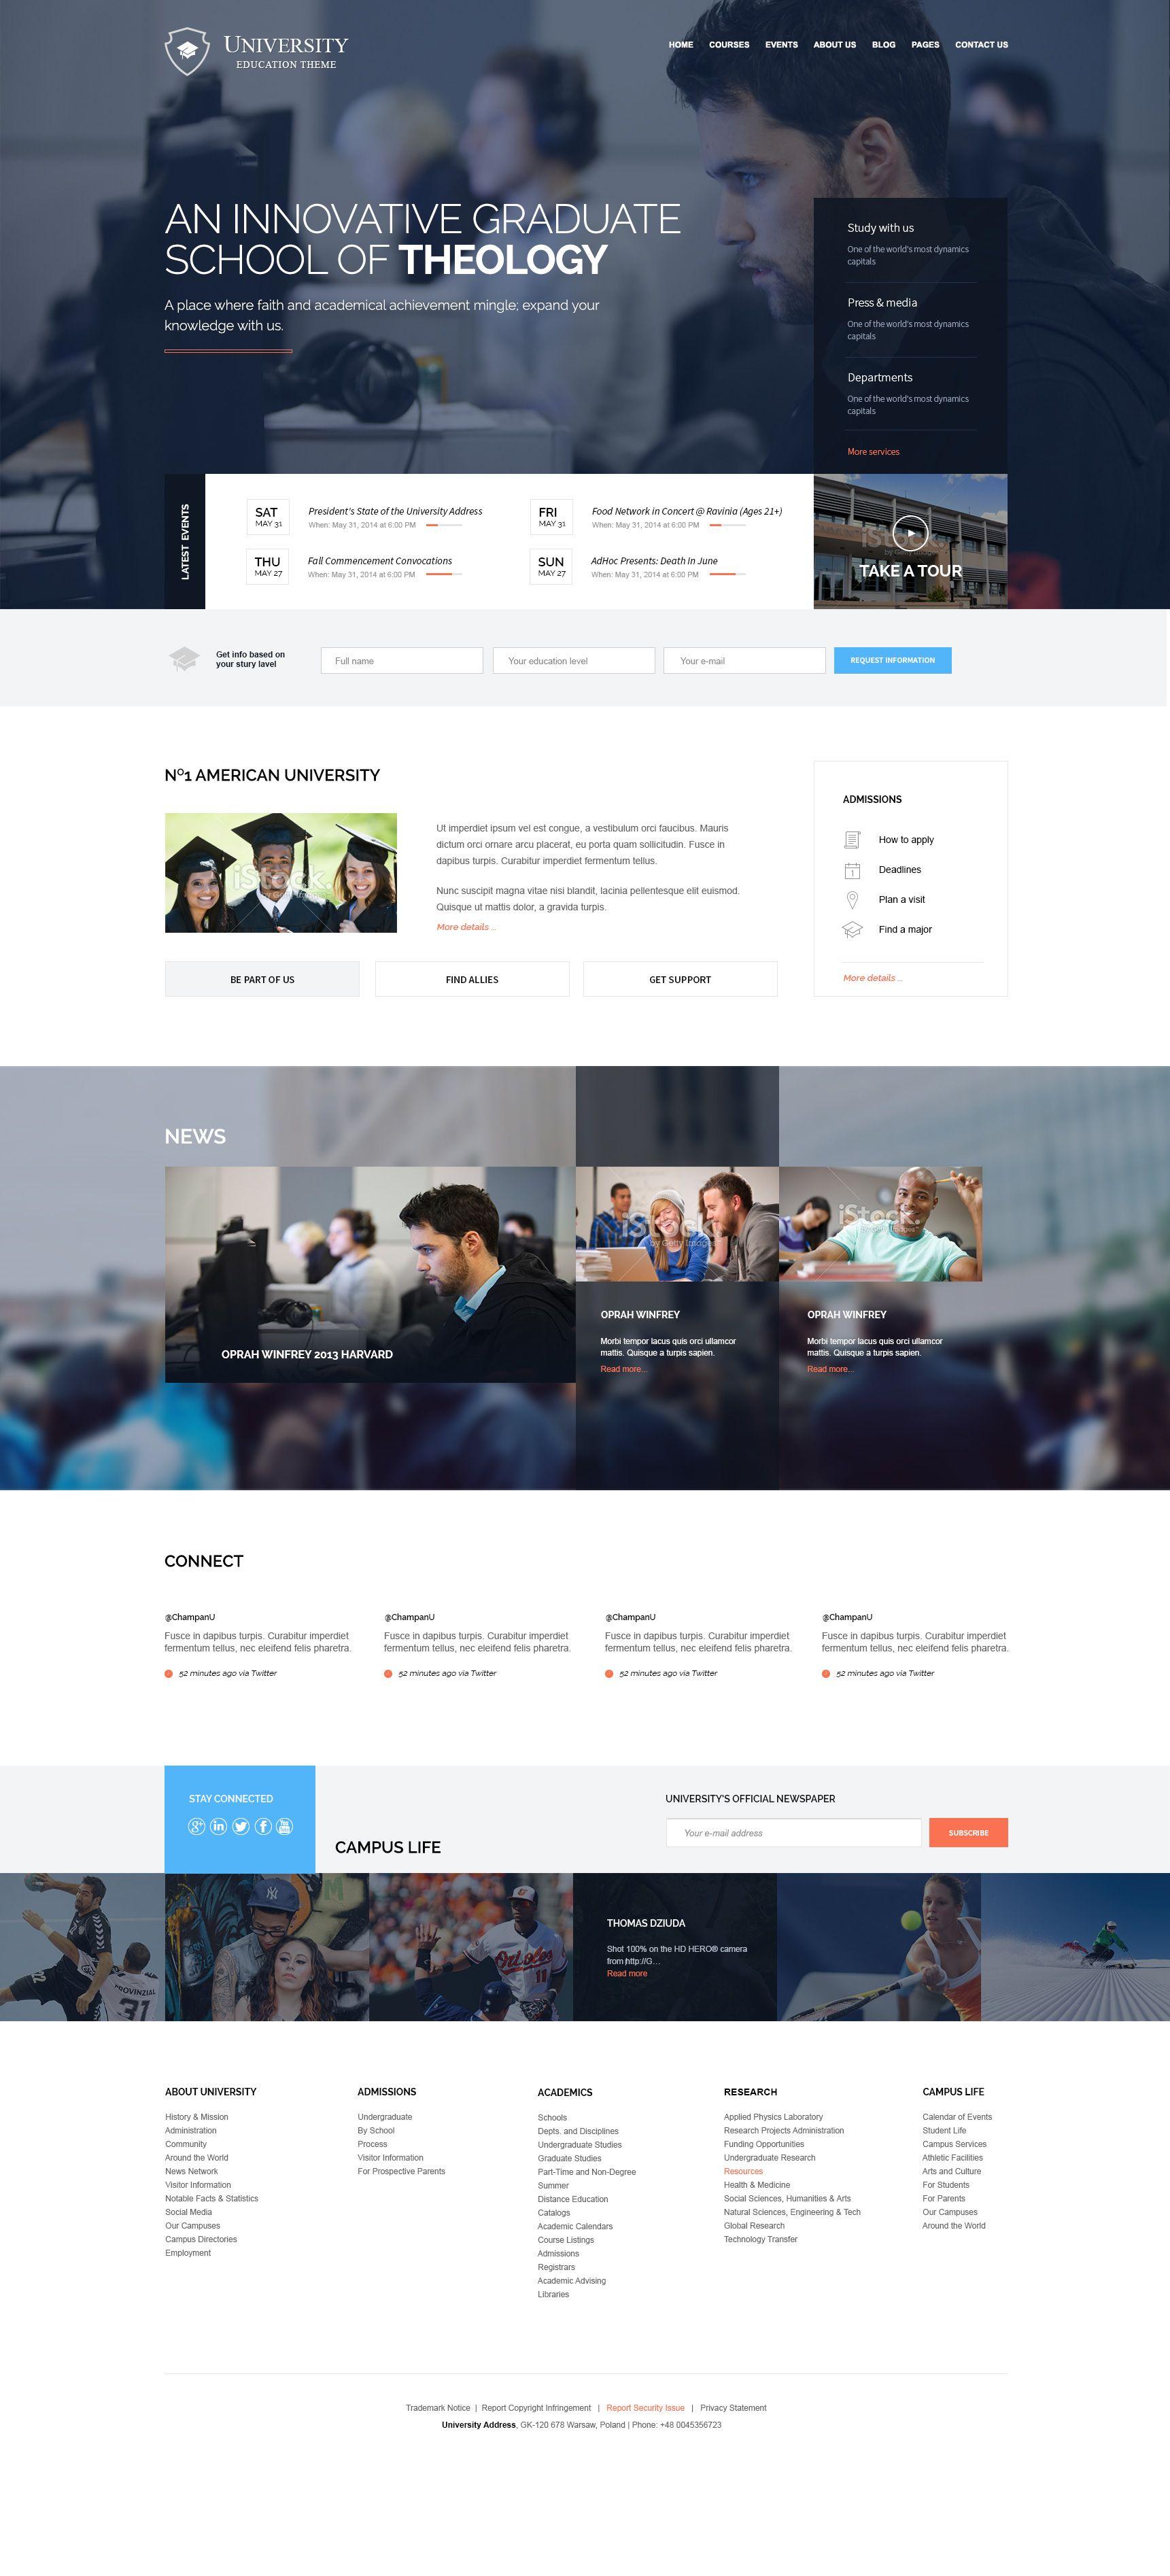 Https Dribbble Com Shots 1572184 University Theme Attachments 241763 Education Wordpress Themes Web Layout Design Website Design Services